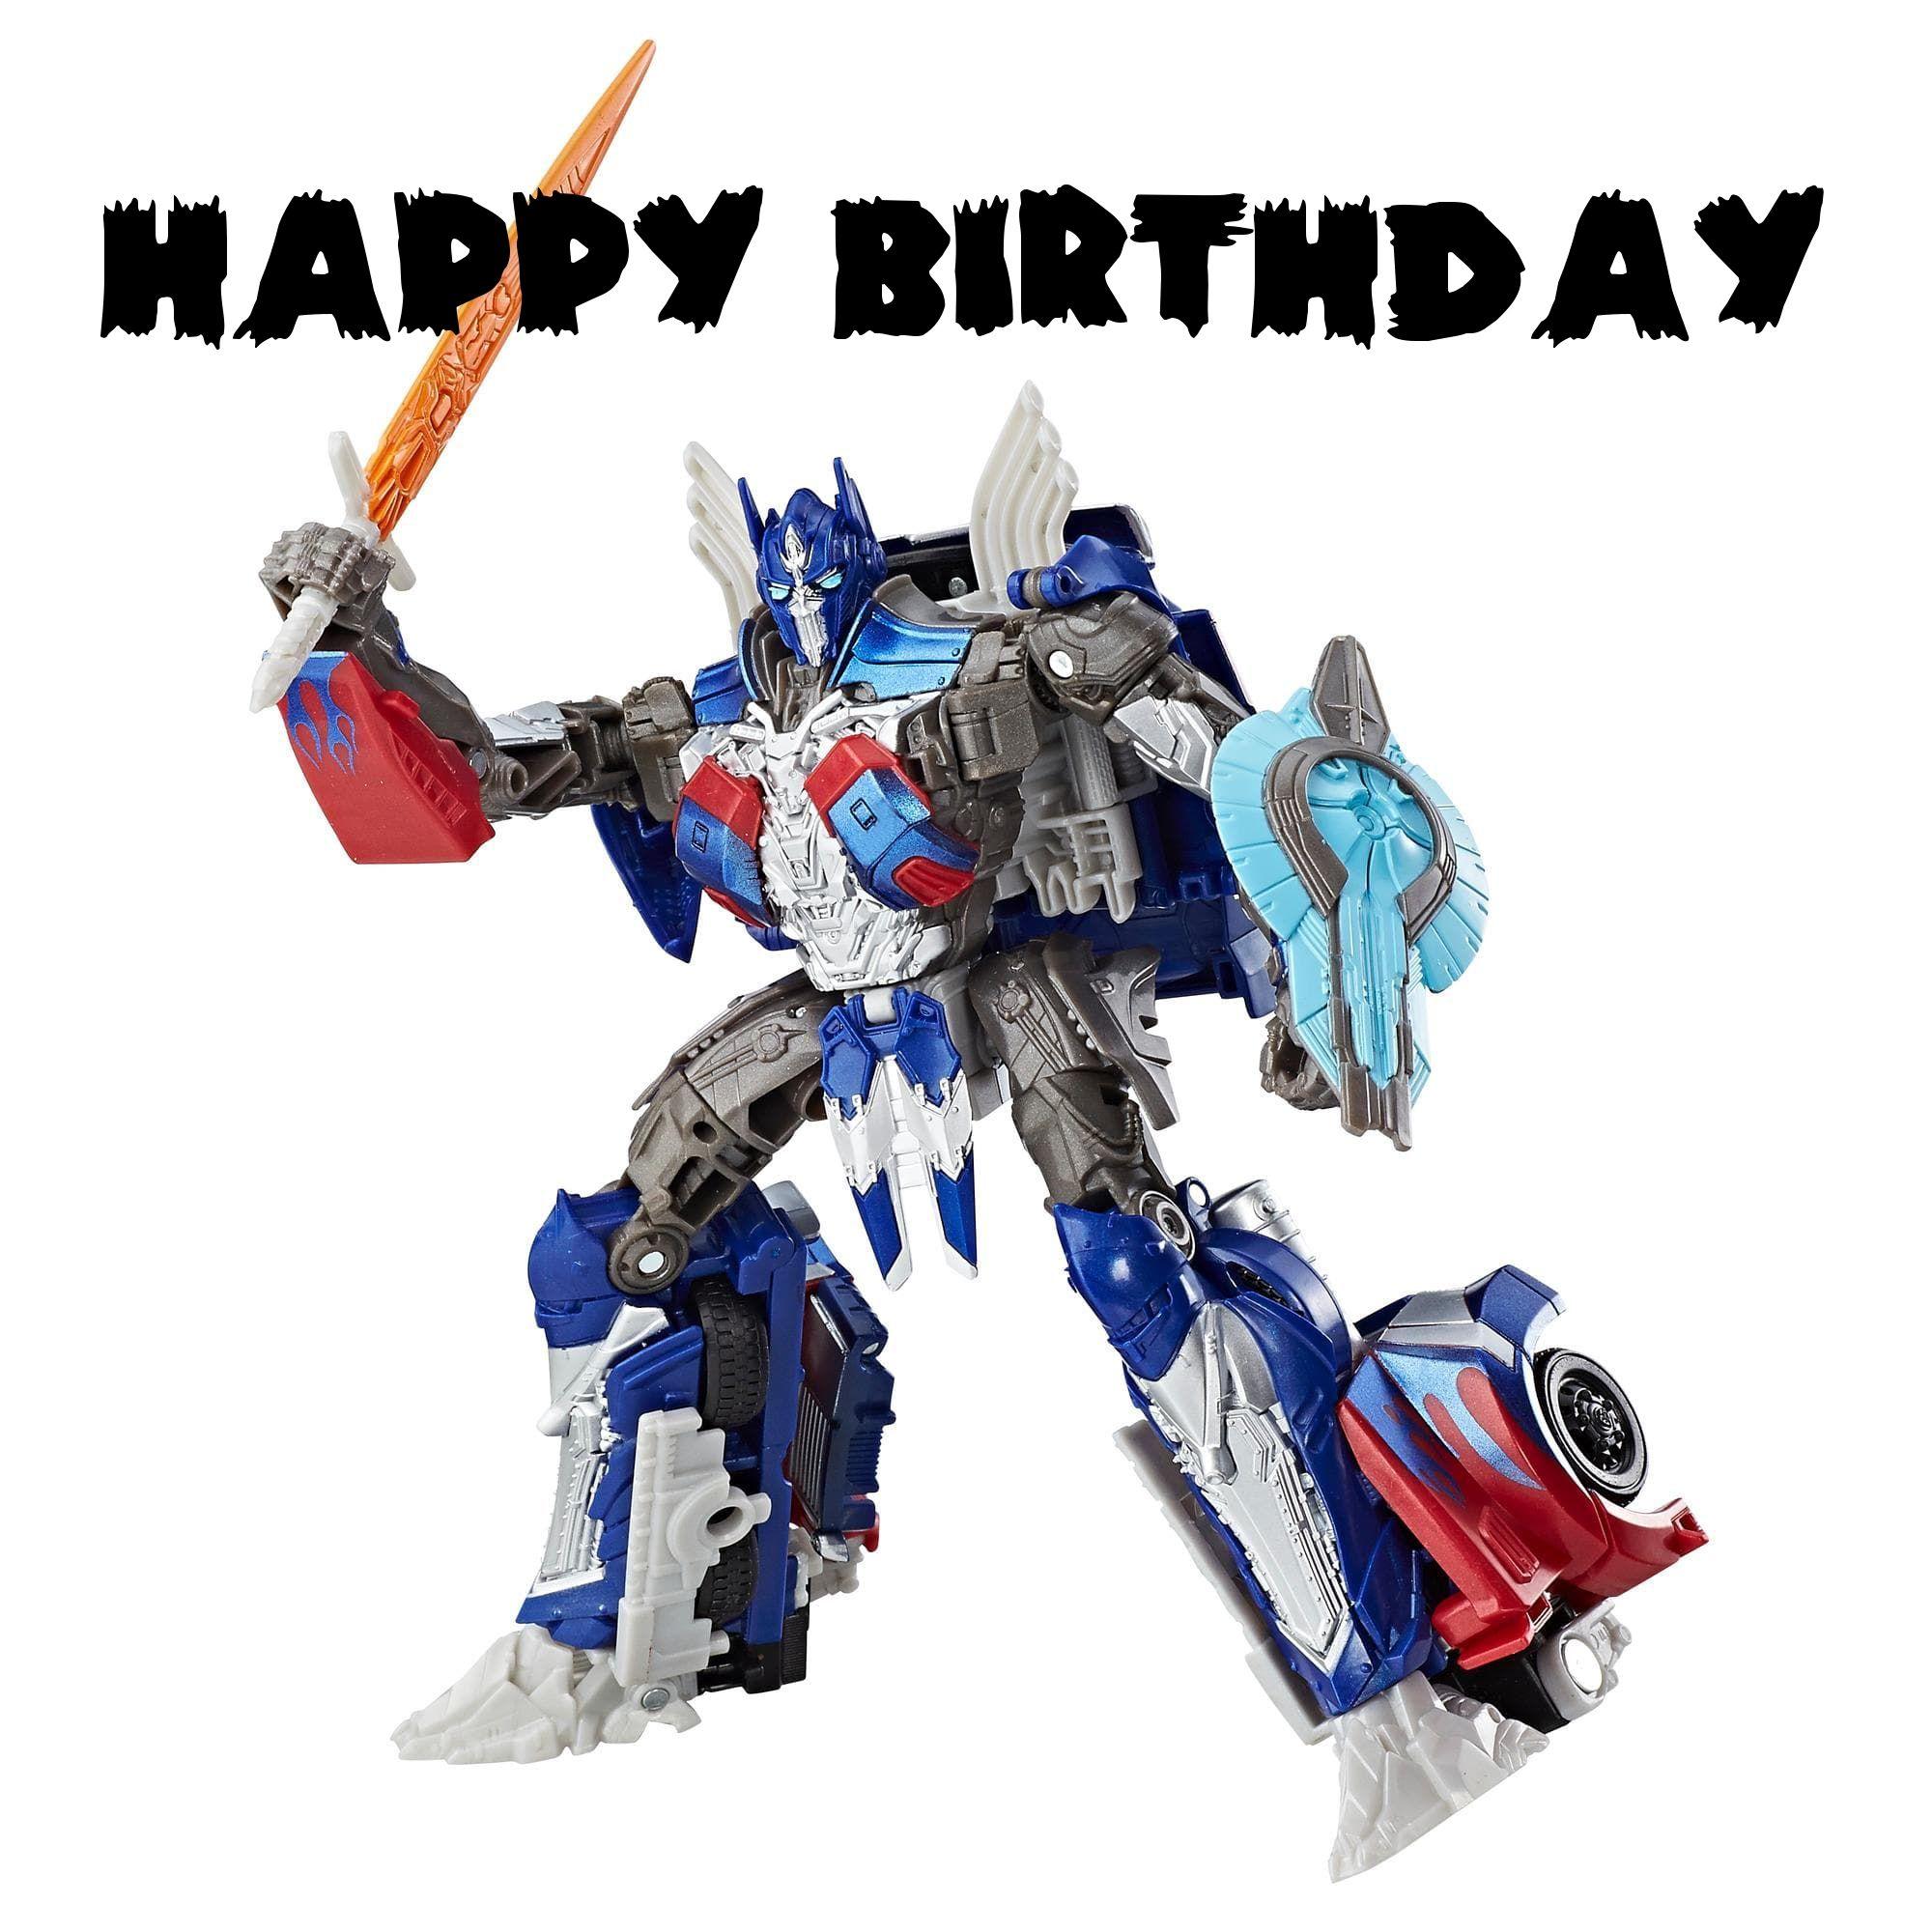 Transformers Birthday Cards Optimus Prime Toy Optimus Prime Last Knights